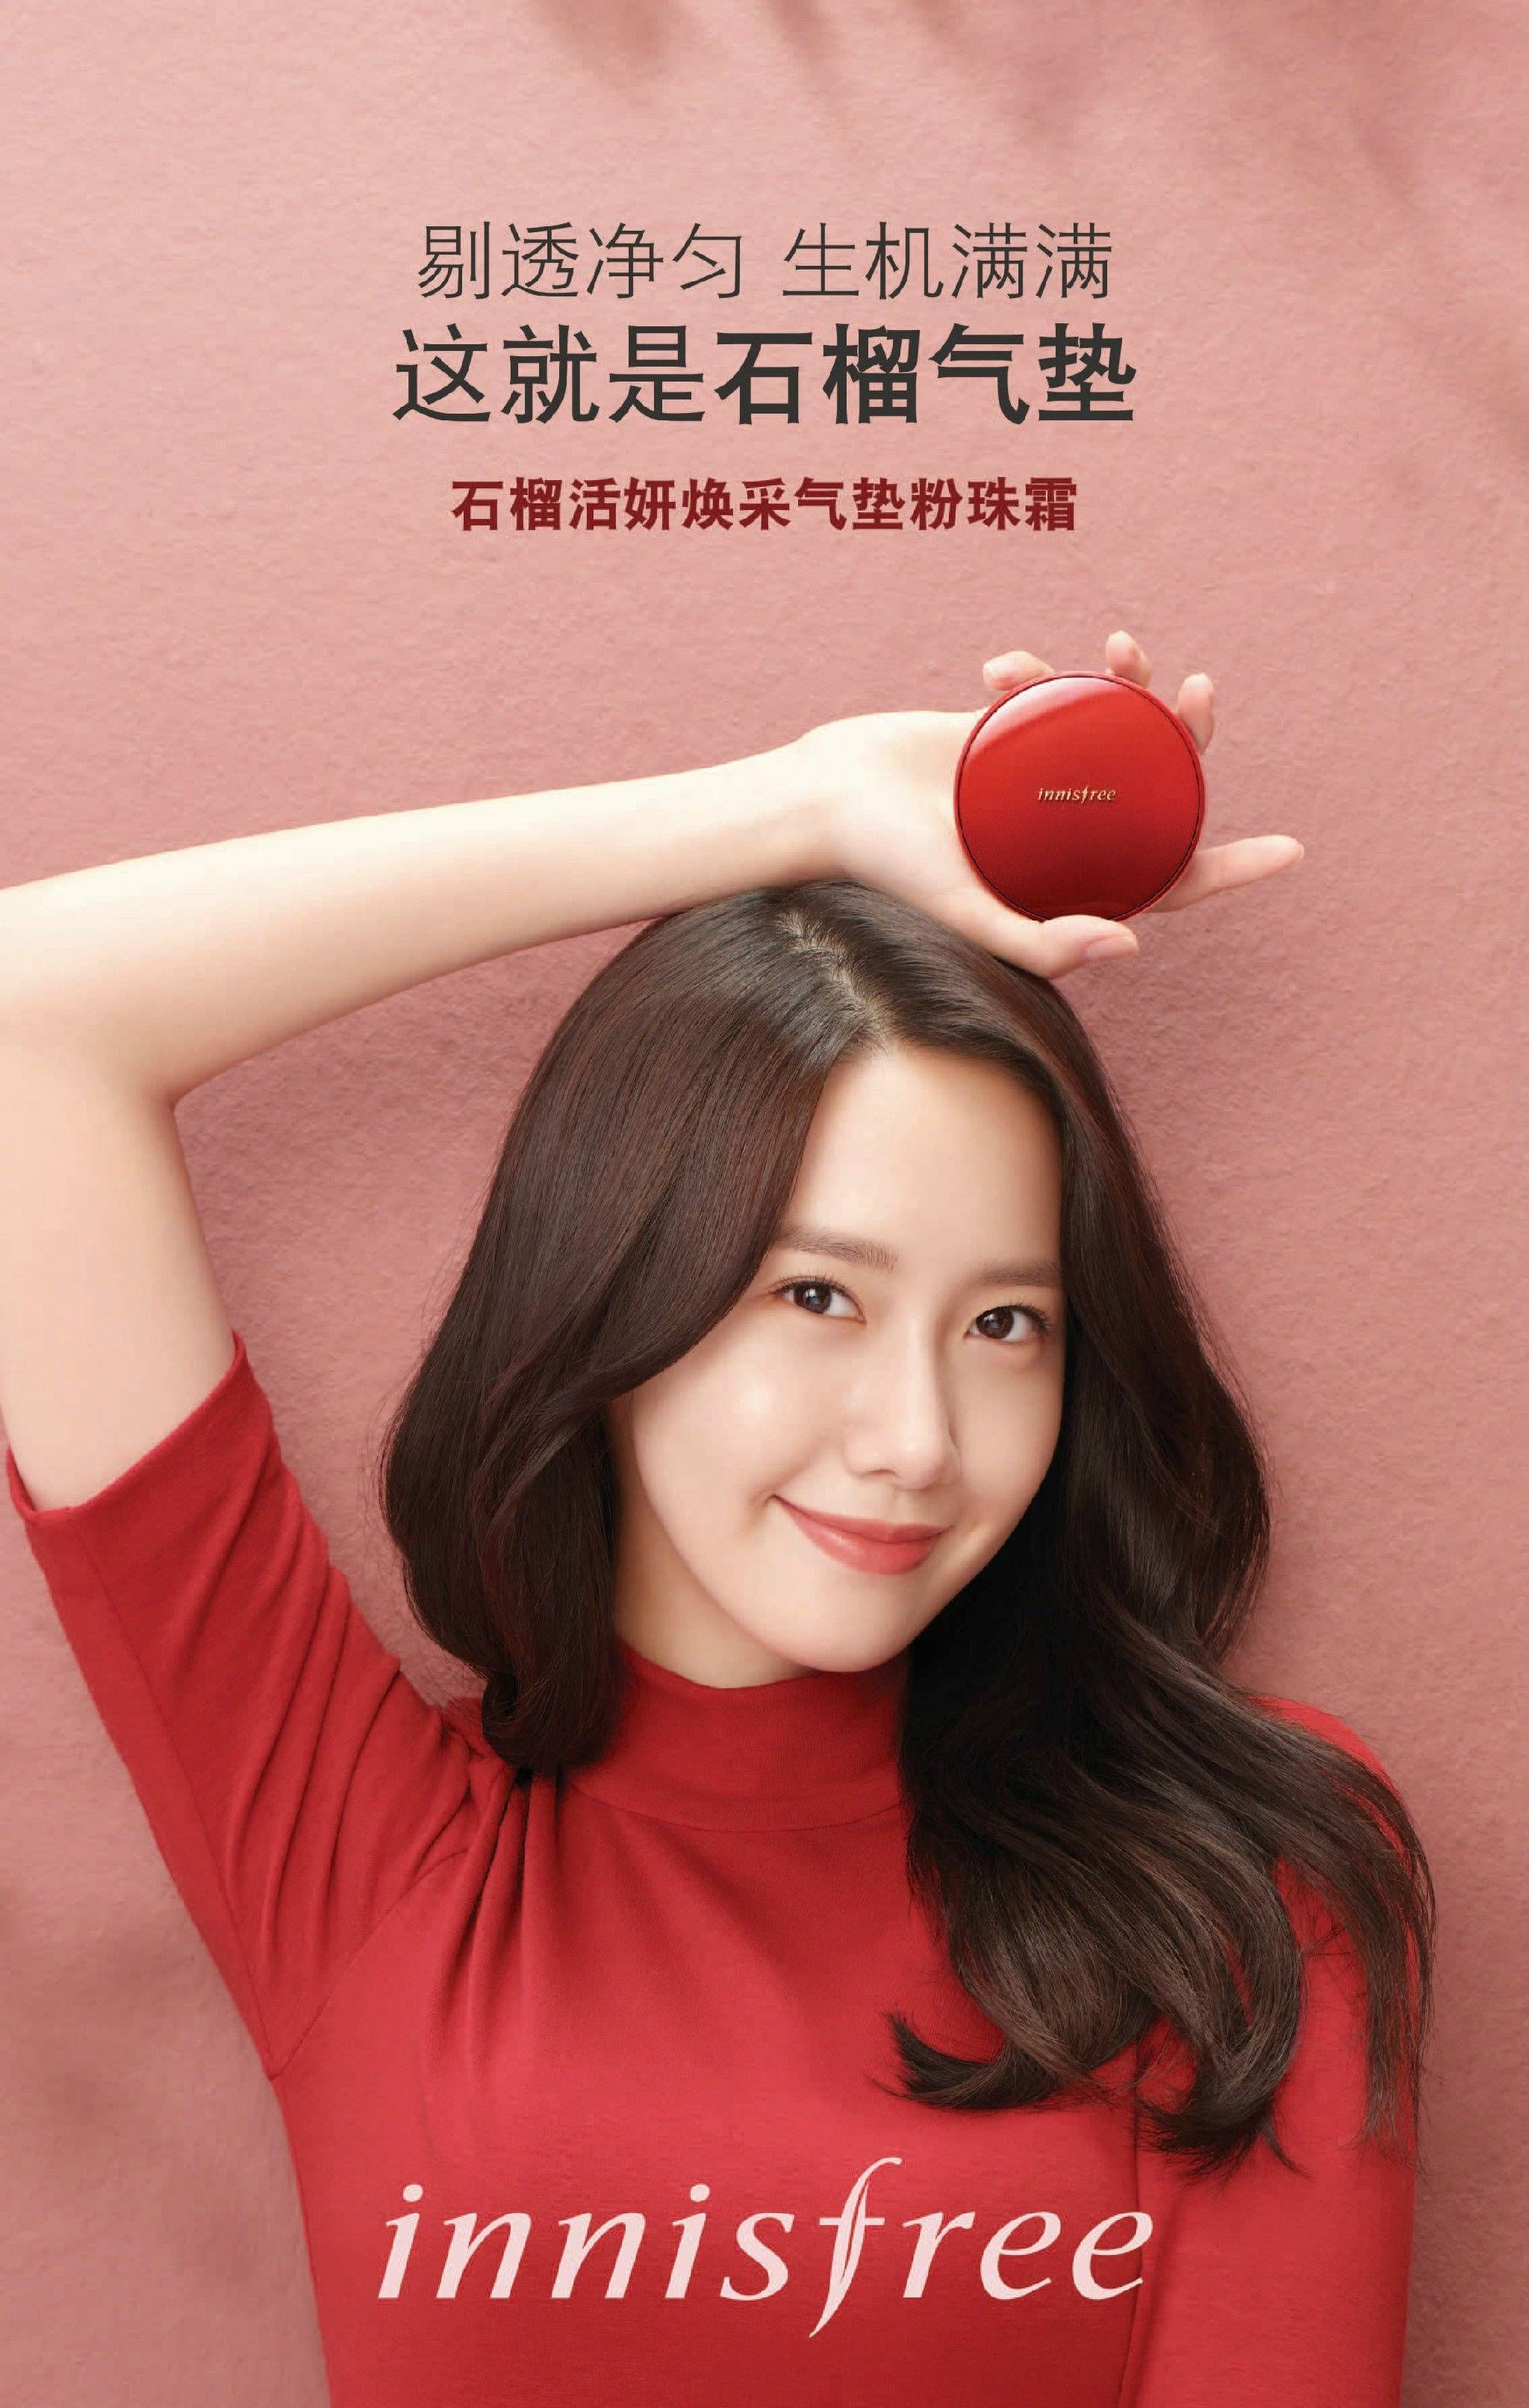 171013 innisfree SNSD Yoona (Dengan gambar)